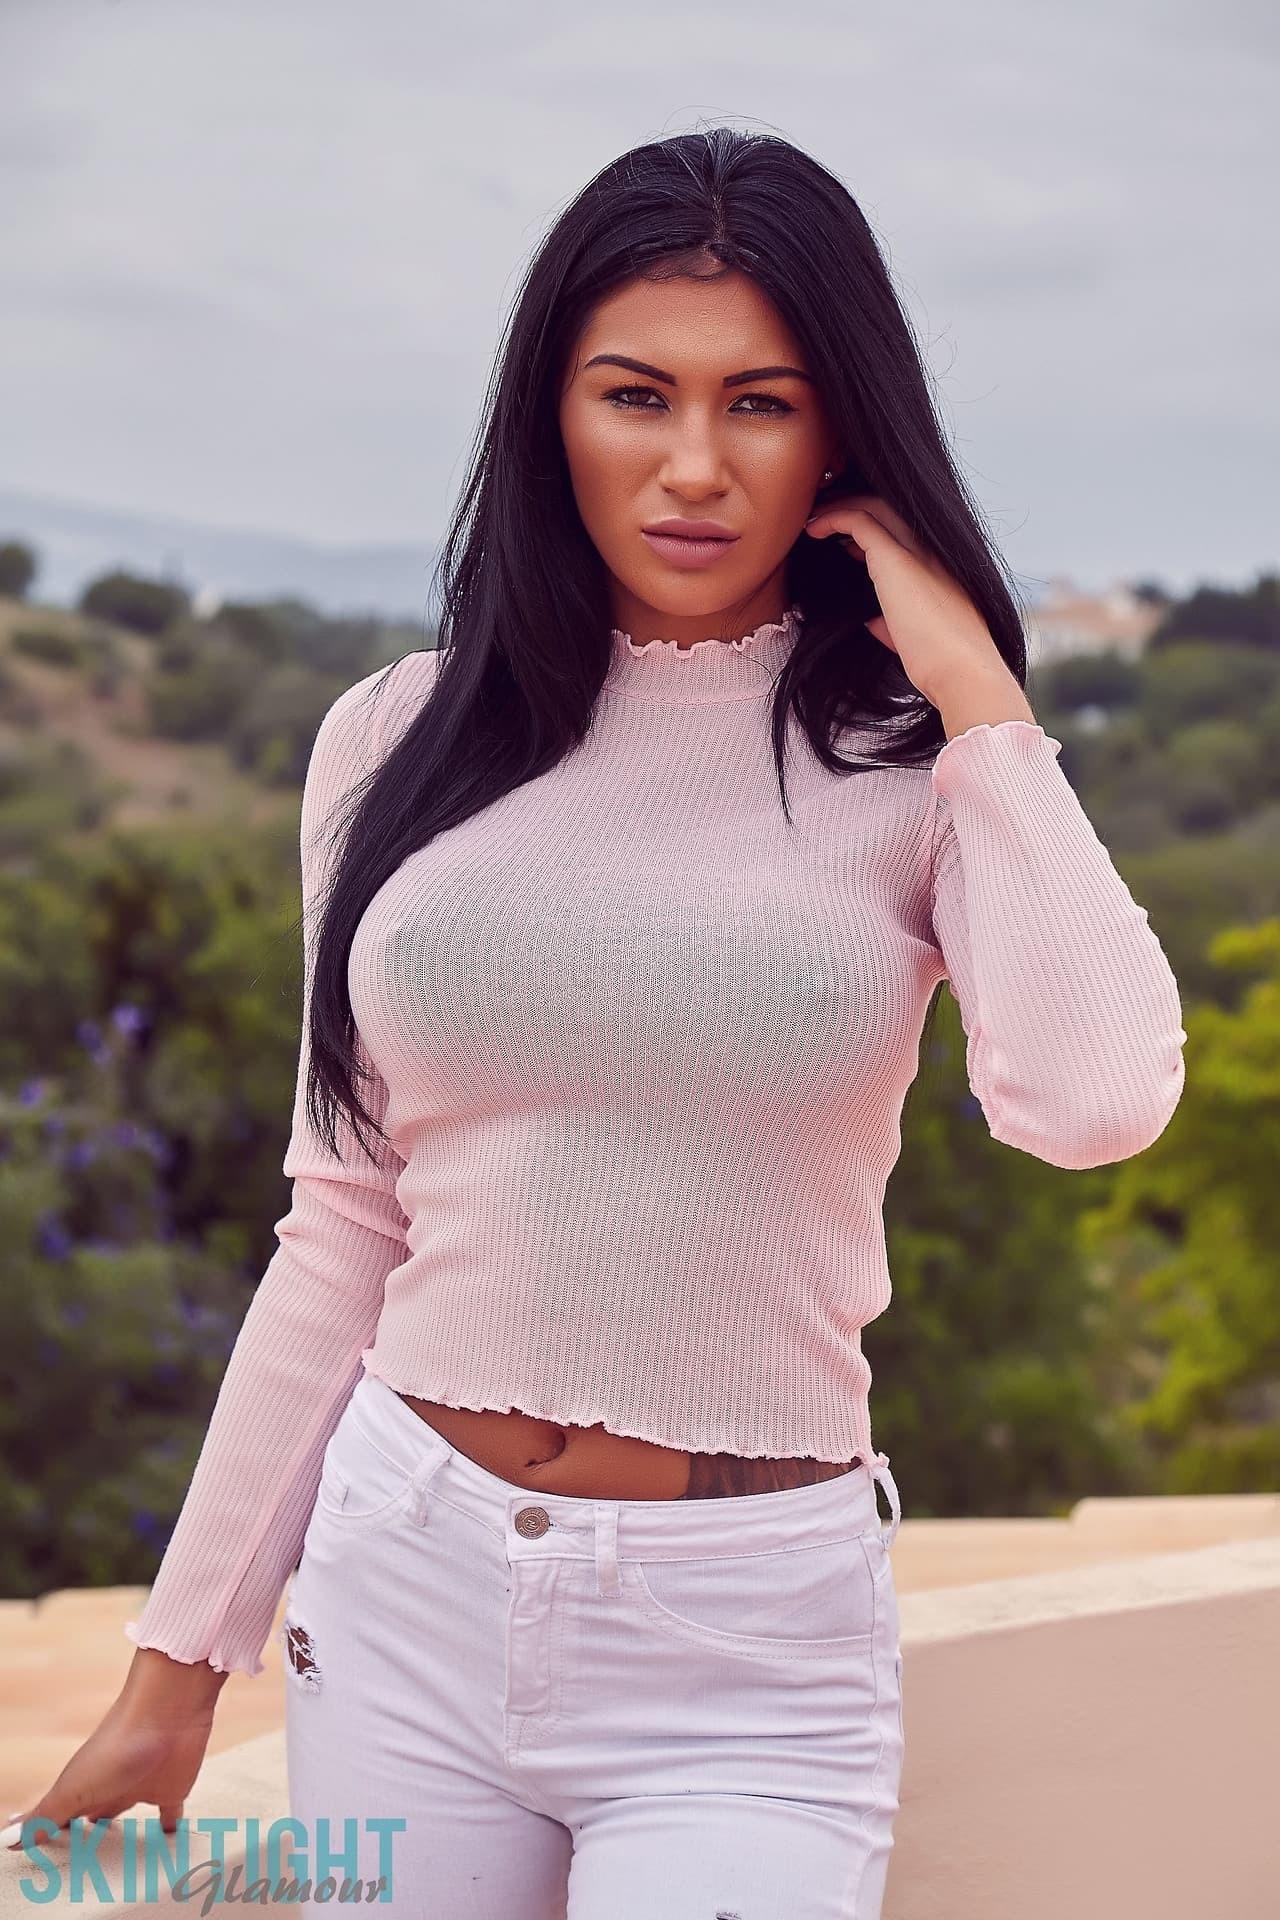 Девушка в джинсах с упругими буферами - фото